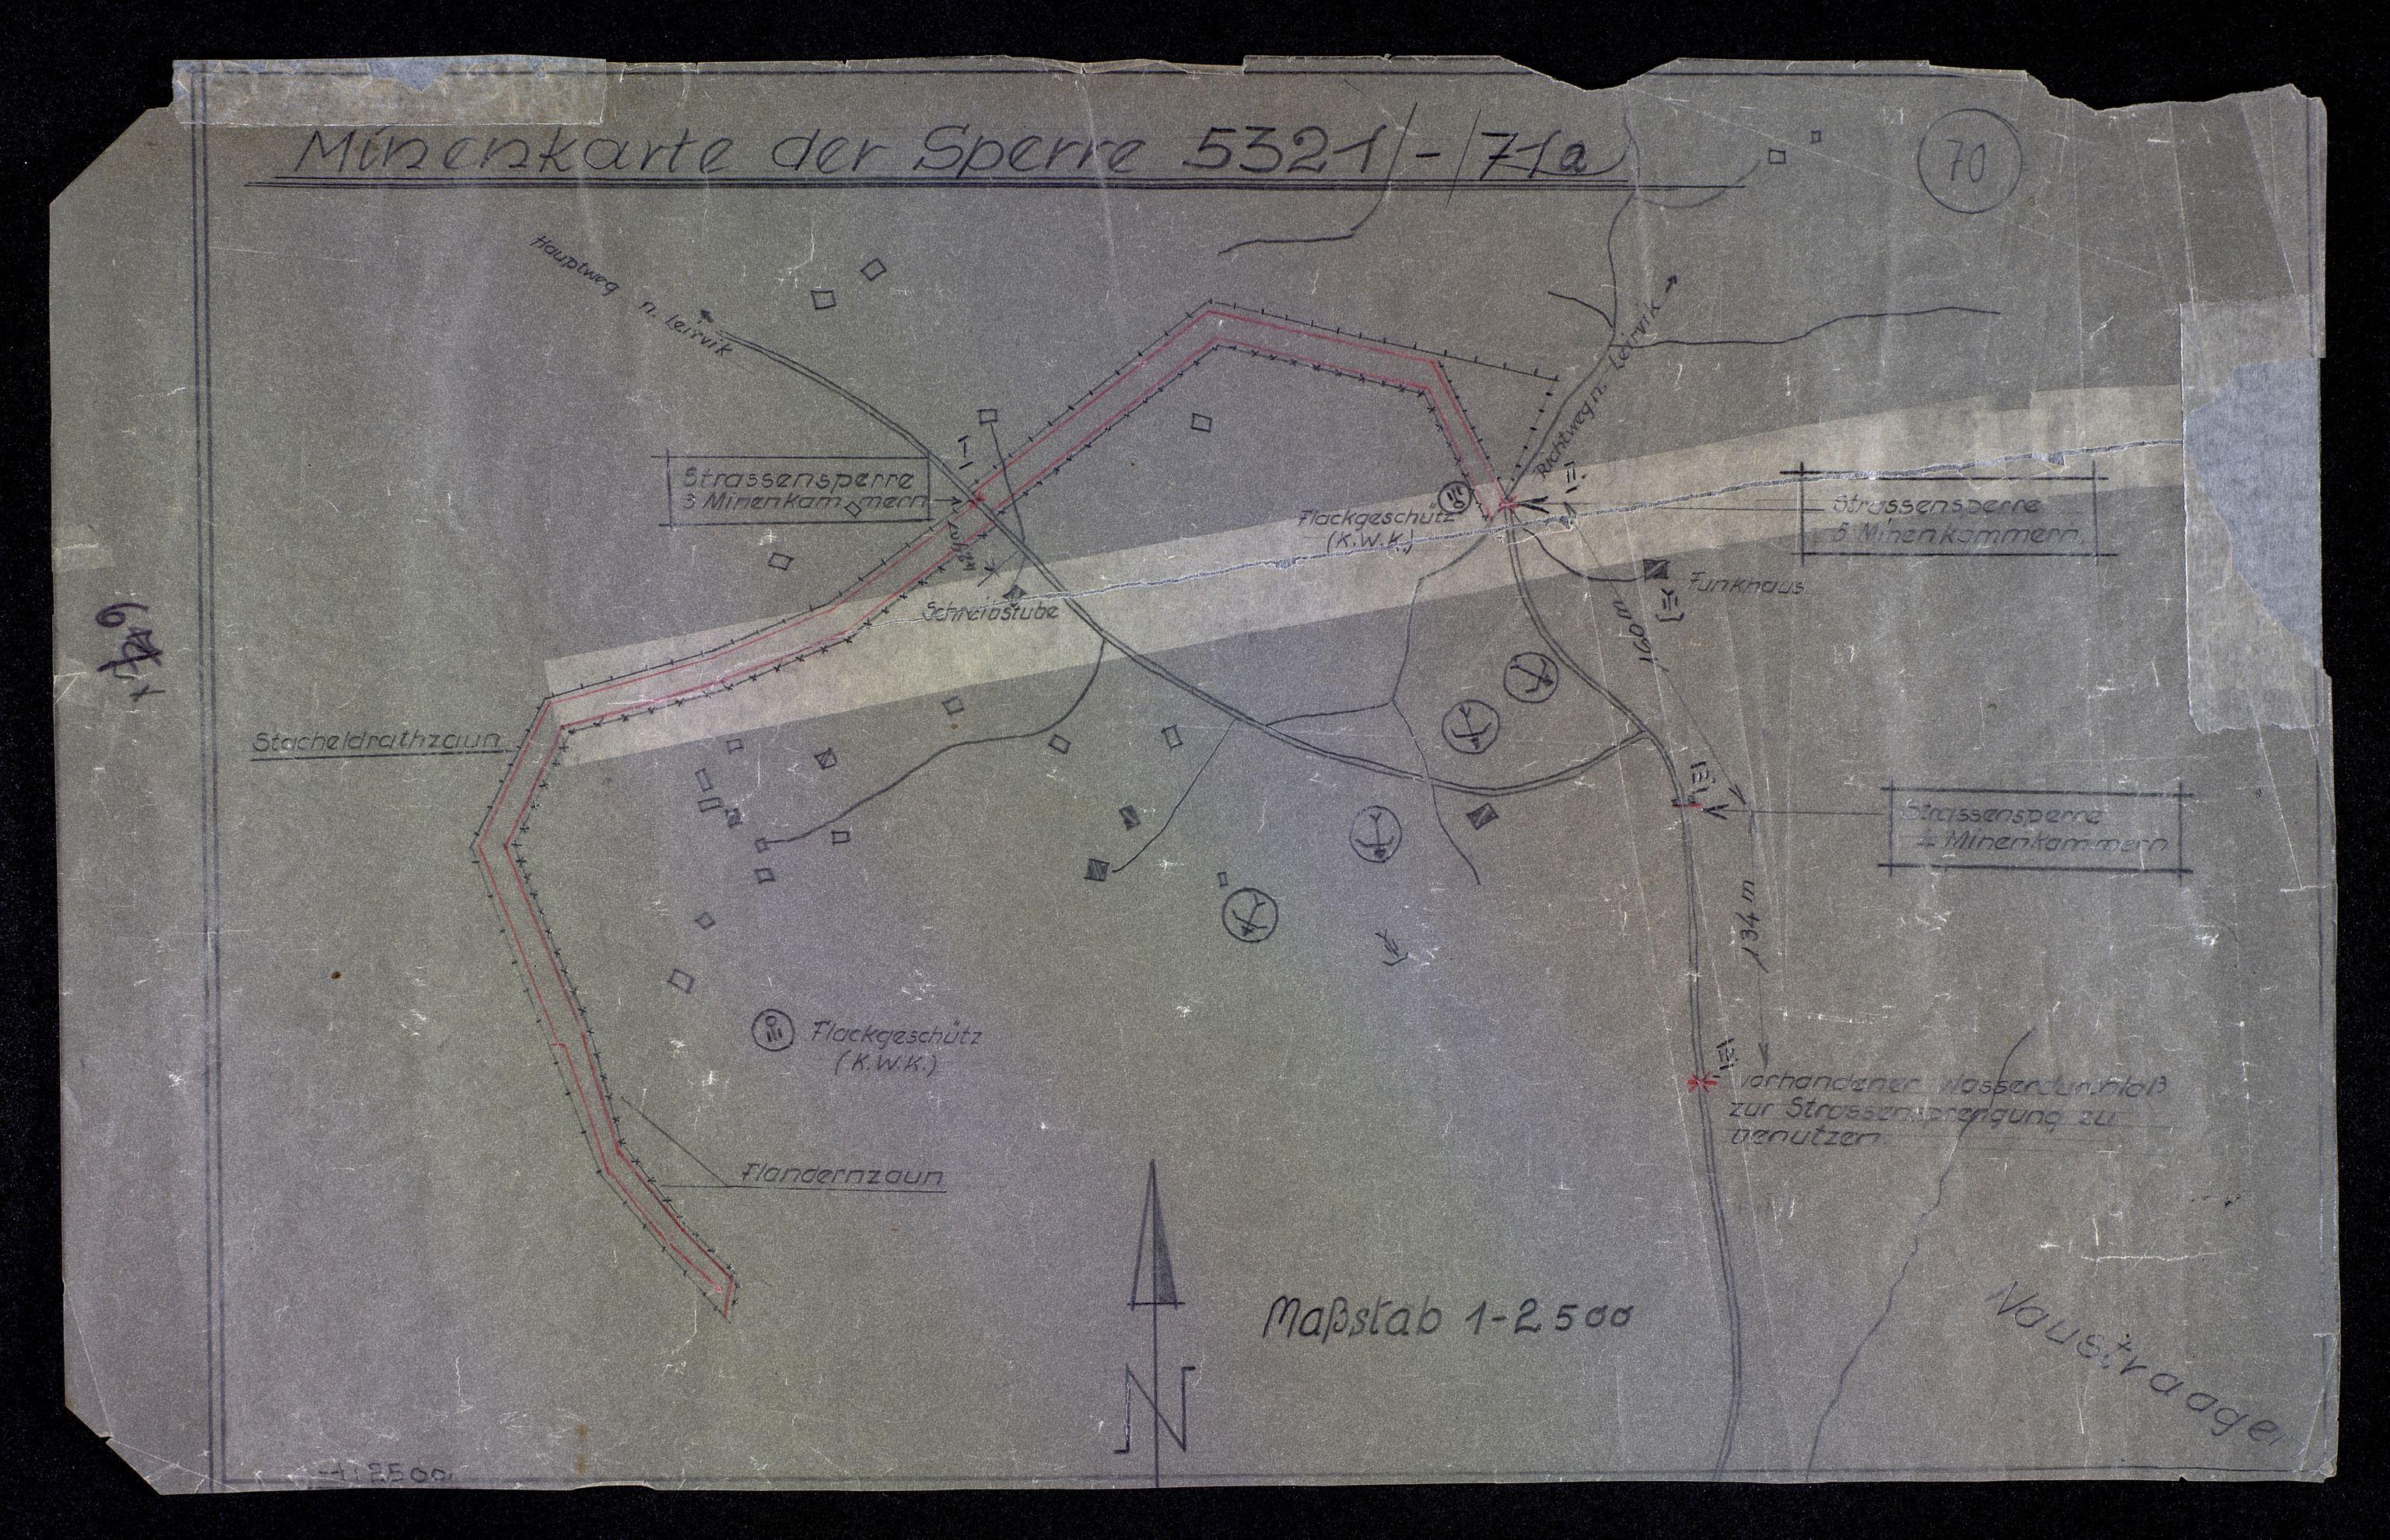 SAB, Ukjent arkiv (SAB), 1943-1945, s. 74